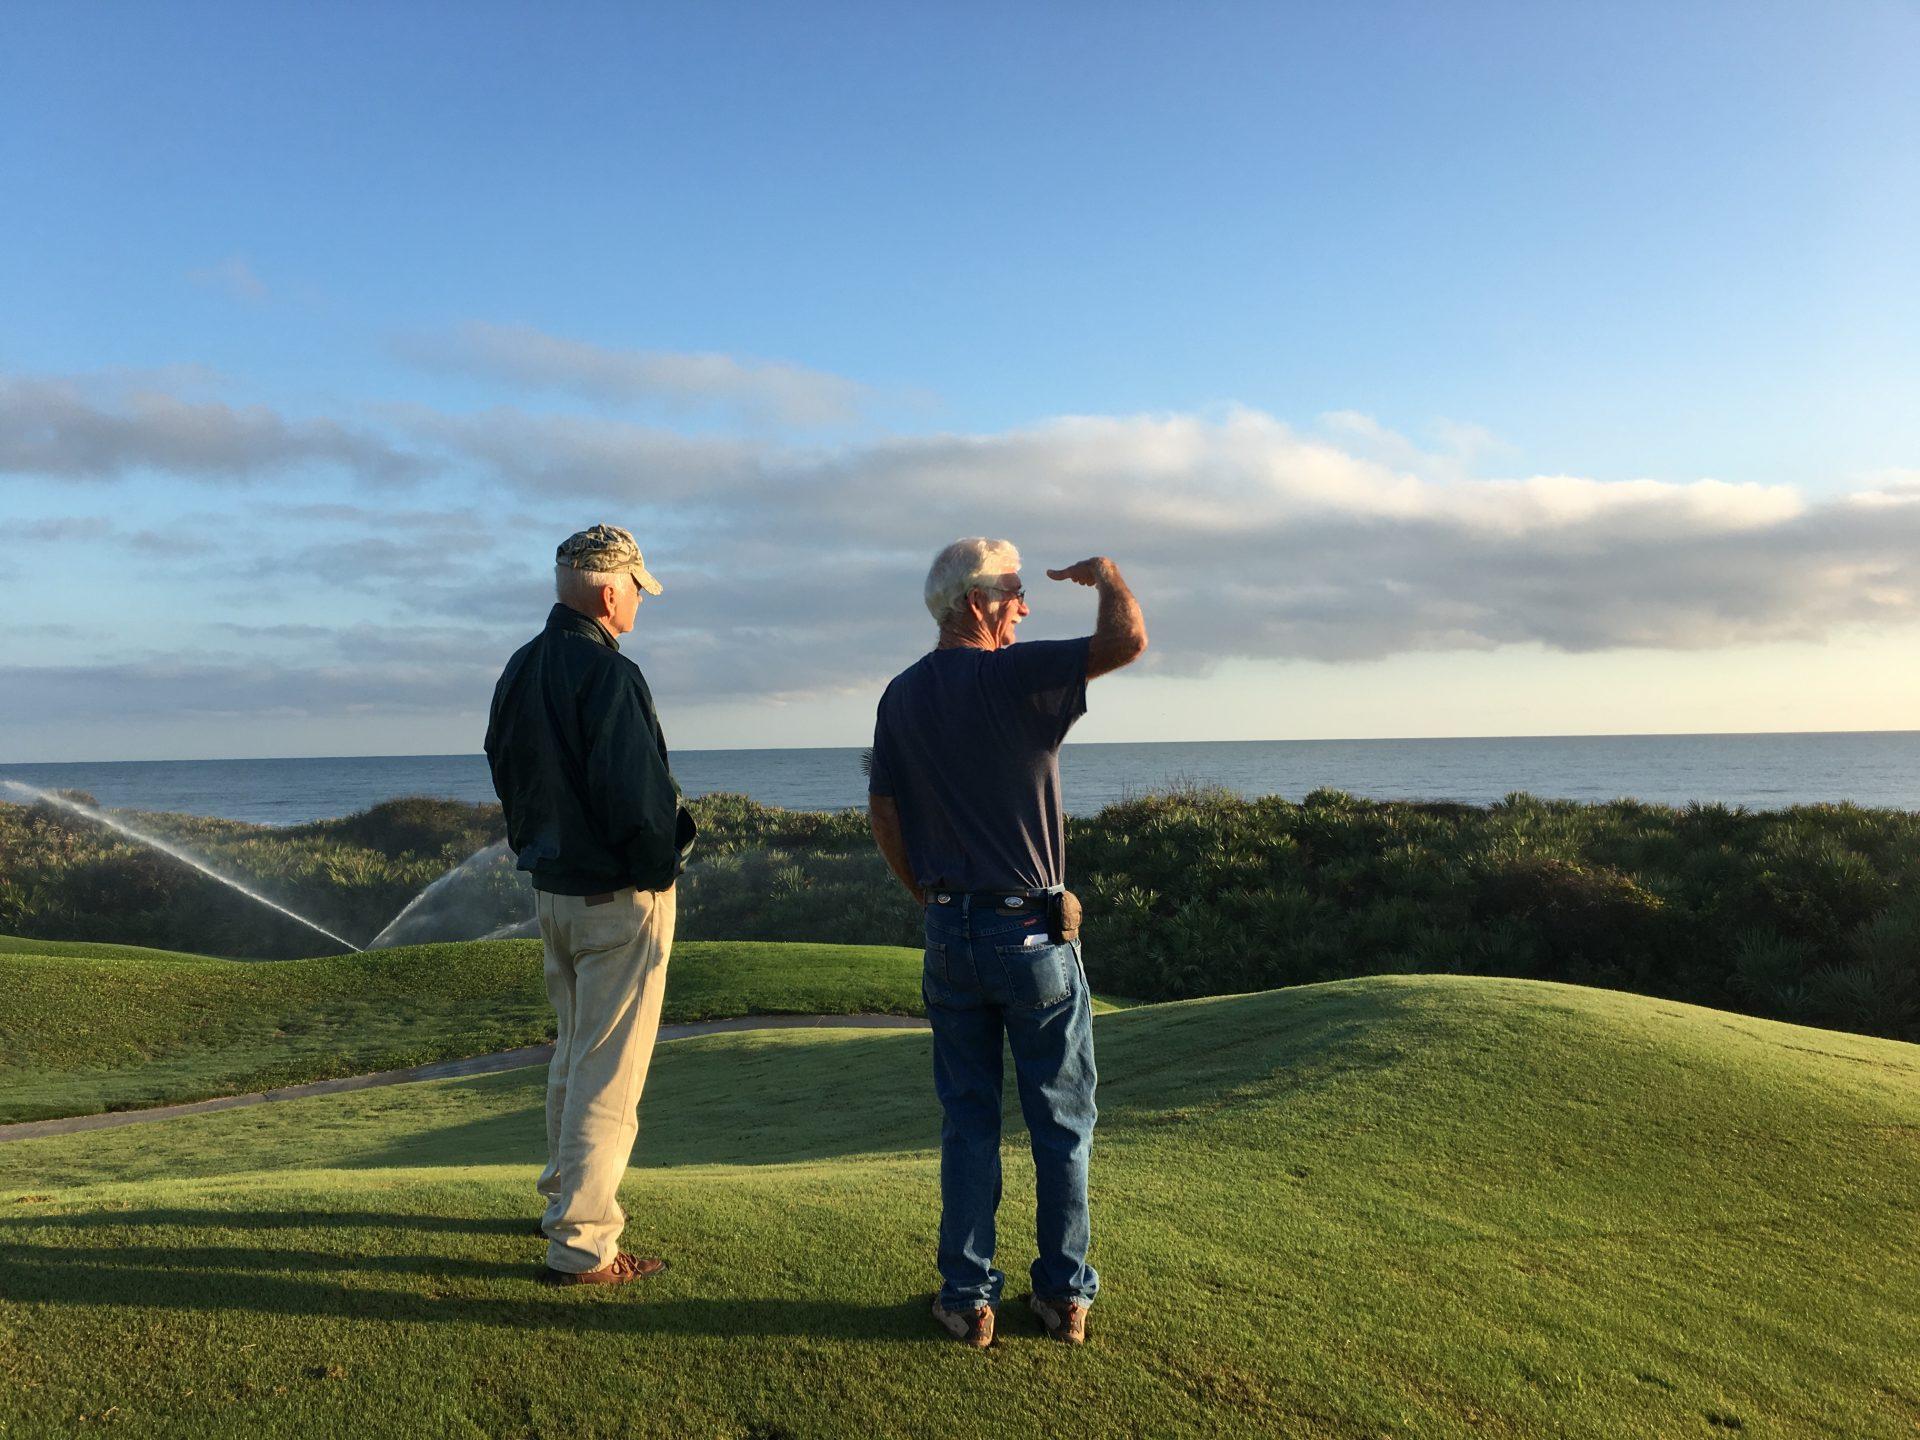 Golf Course with Joe Gish